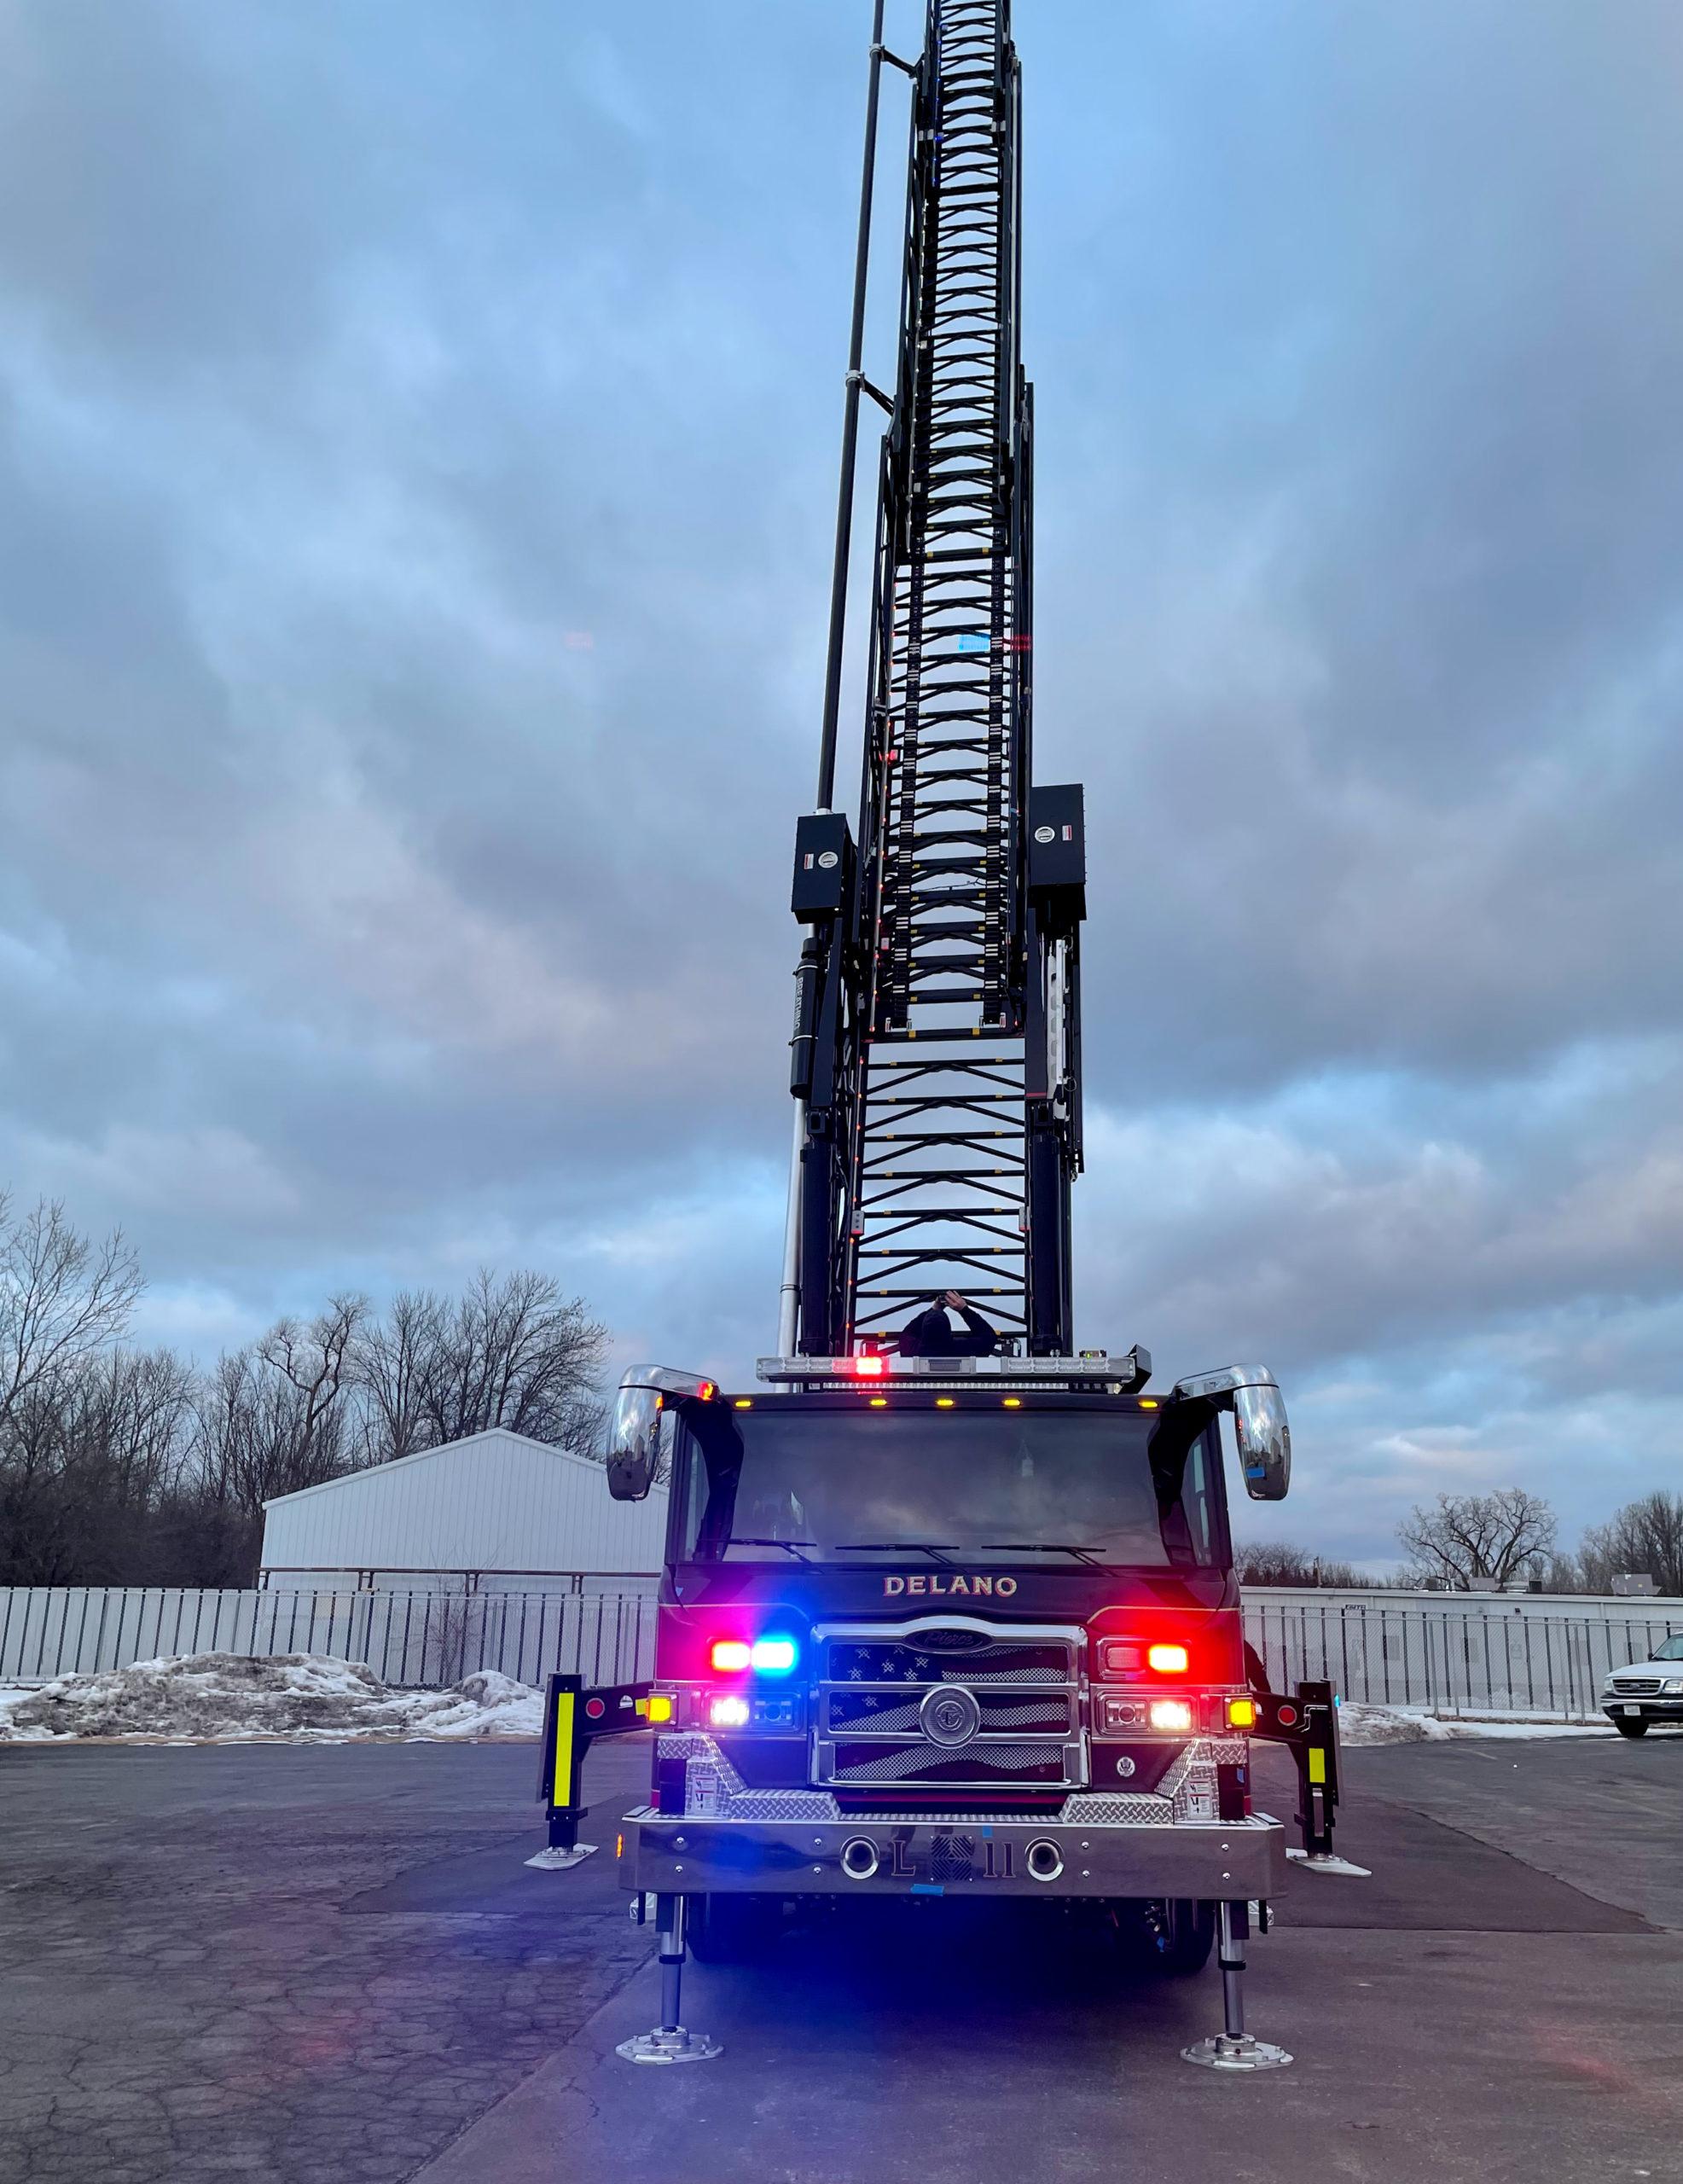 Delano Fire Department - Aerial